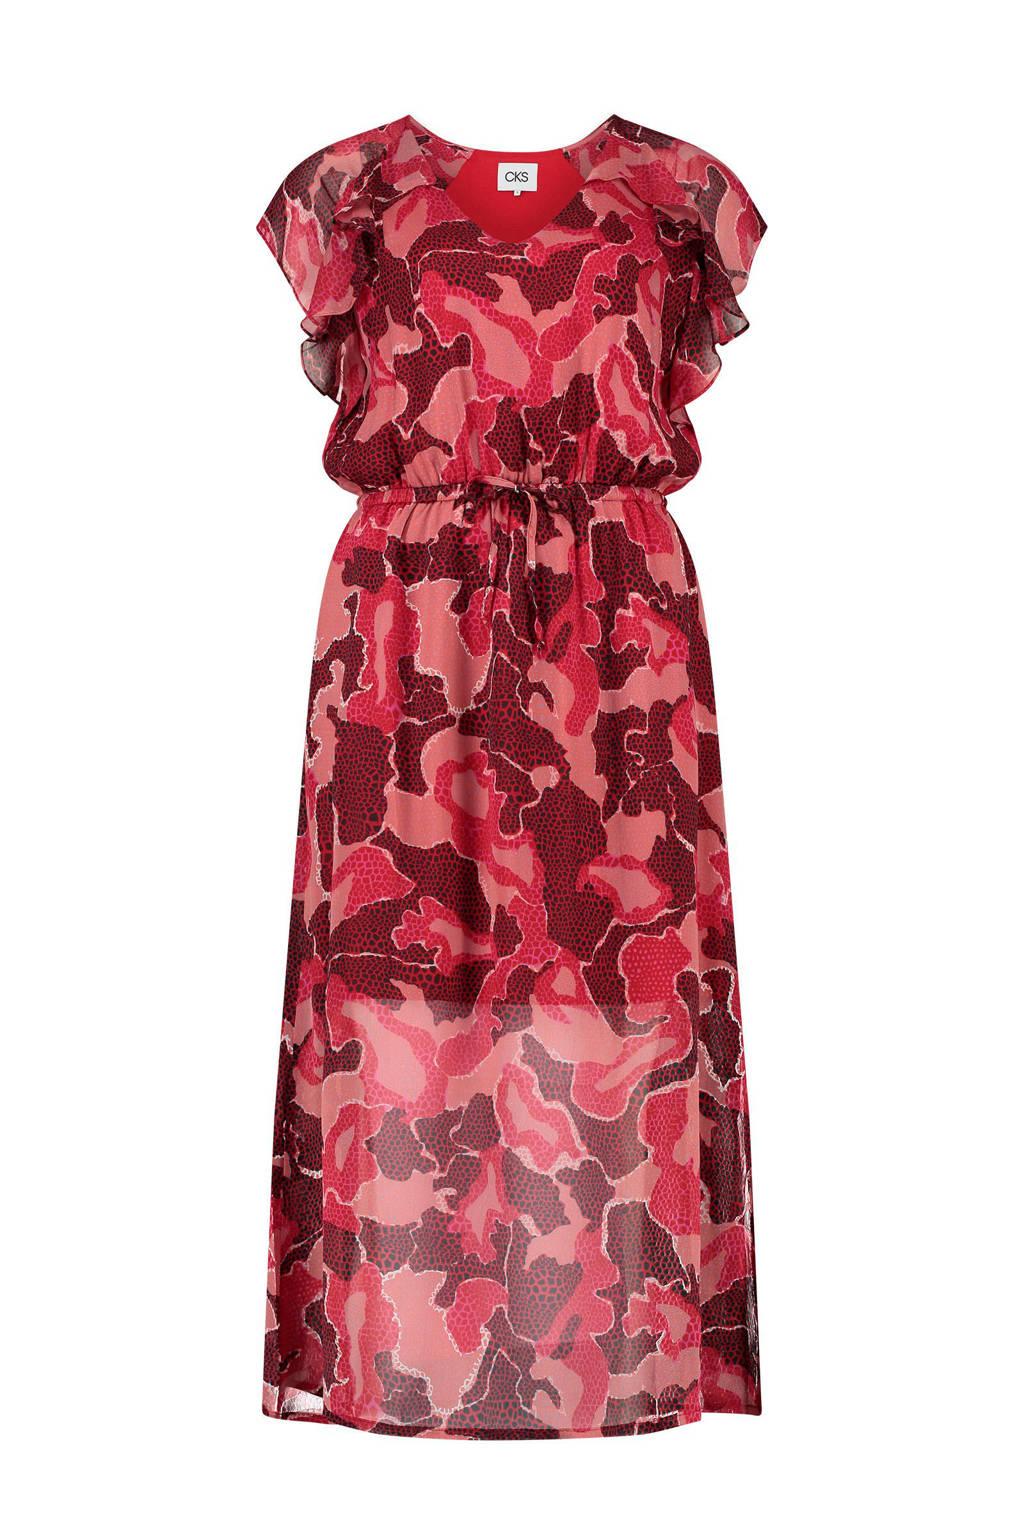 CKS Eri jurk met girafprint en ruches rood/roze, Rood/roze